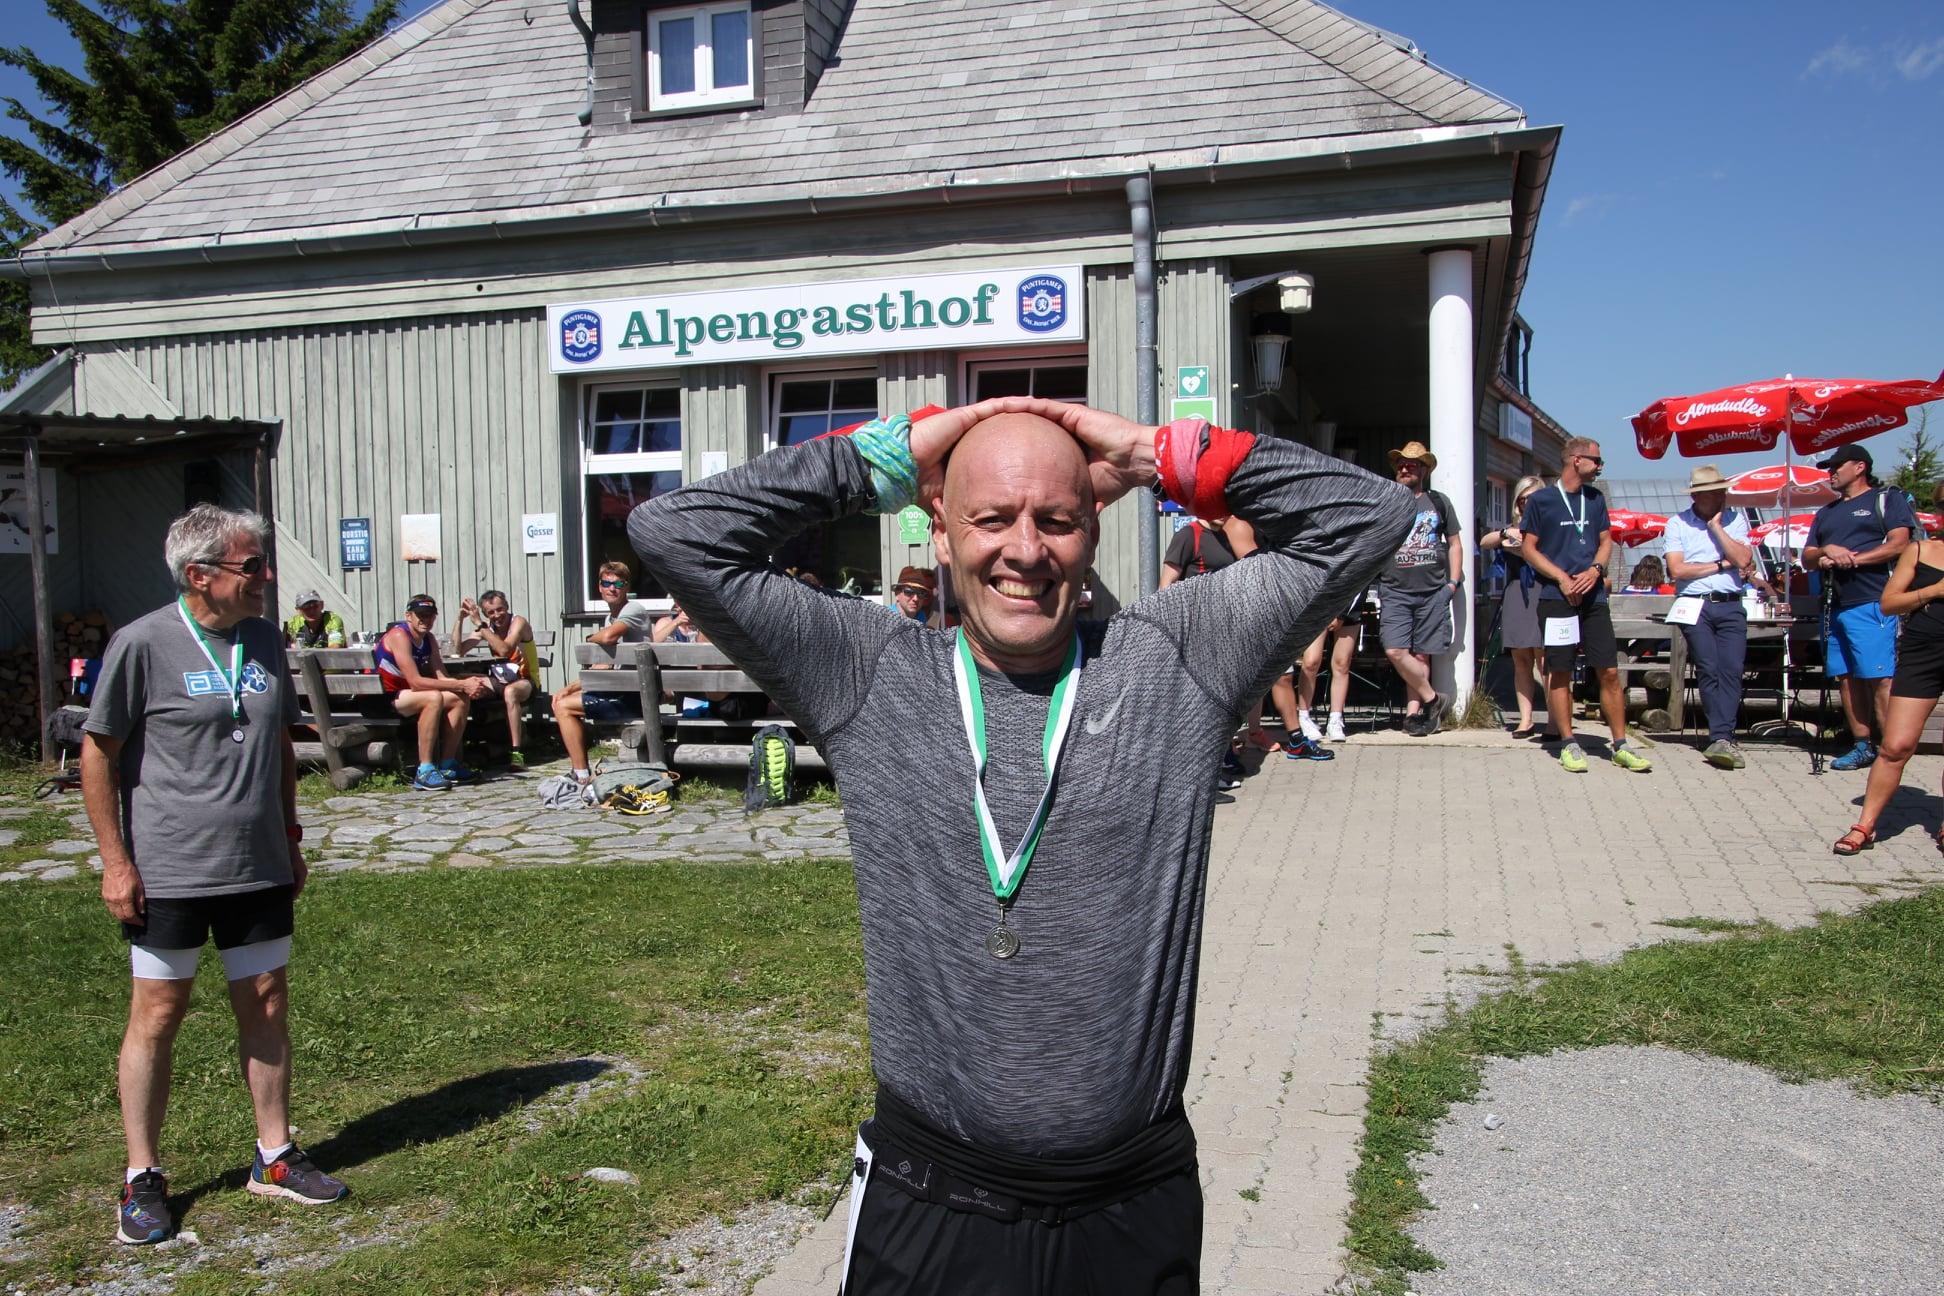 Laufen -rtr-weiz-116584176_3809023042458801_8010408623510024296_o-Schöcklplateau-Marathon 2020